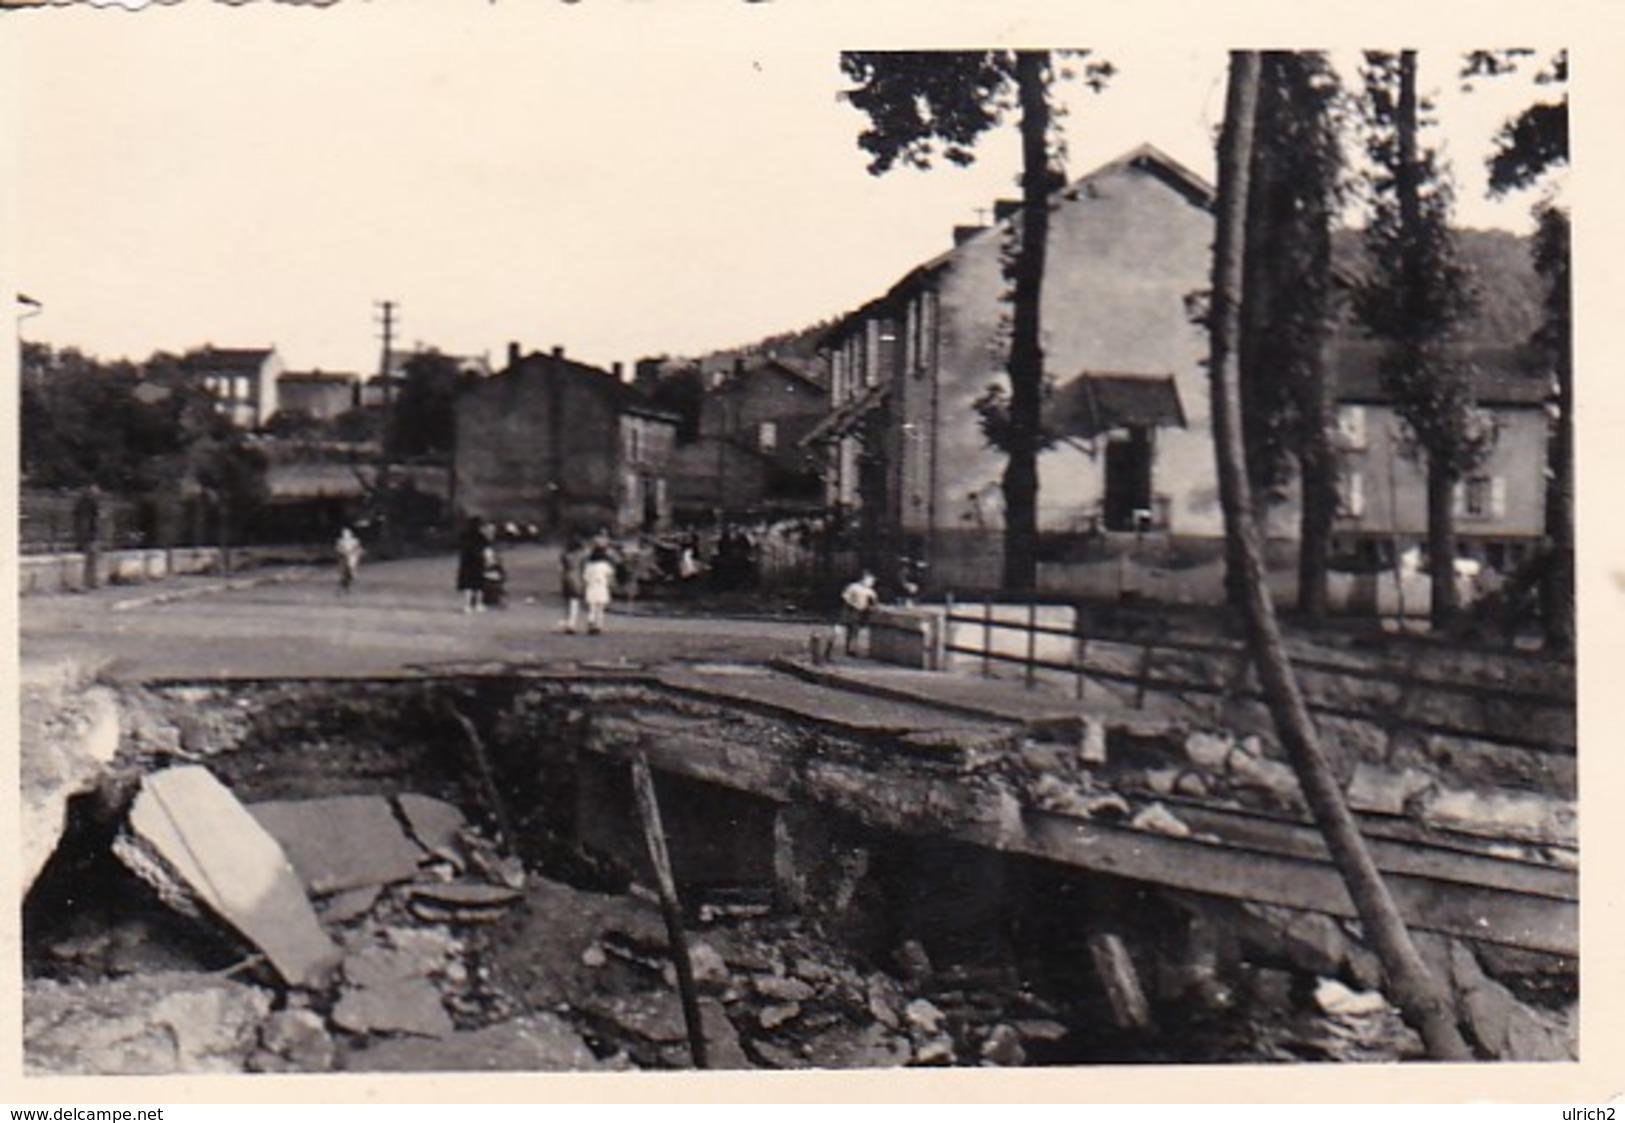 Foto Zerstörte Brücke In Elwangen - 2. WK - 9*6cm  (42541) - War, Military